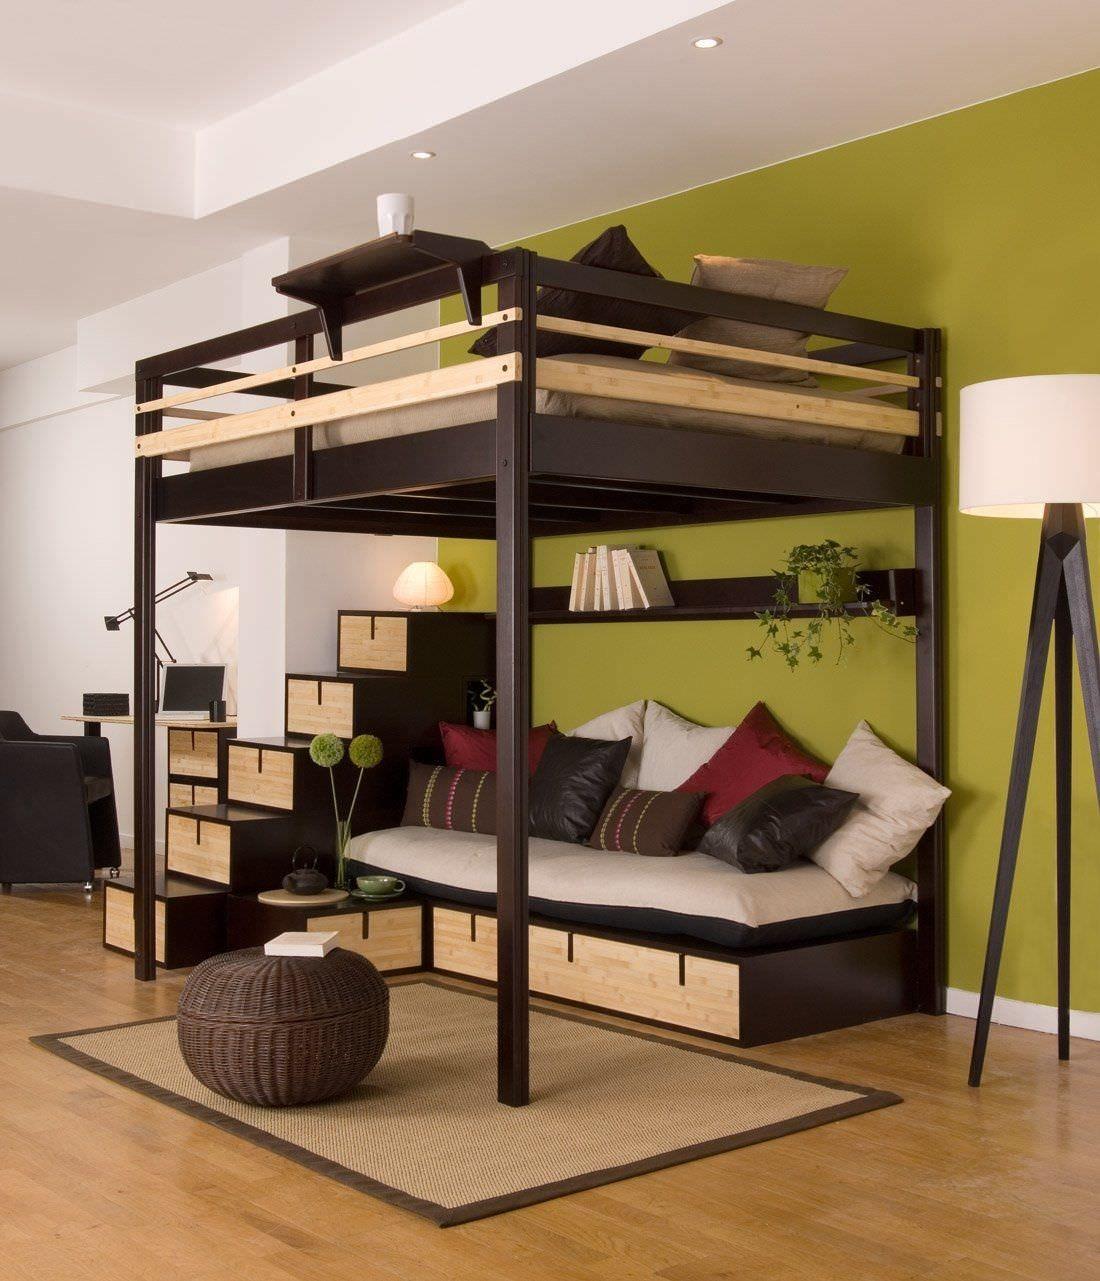 Doppelbett / Hoch / modern / Holz A COUPLE ESPACE LOGGIA … | So ...